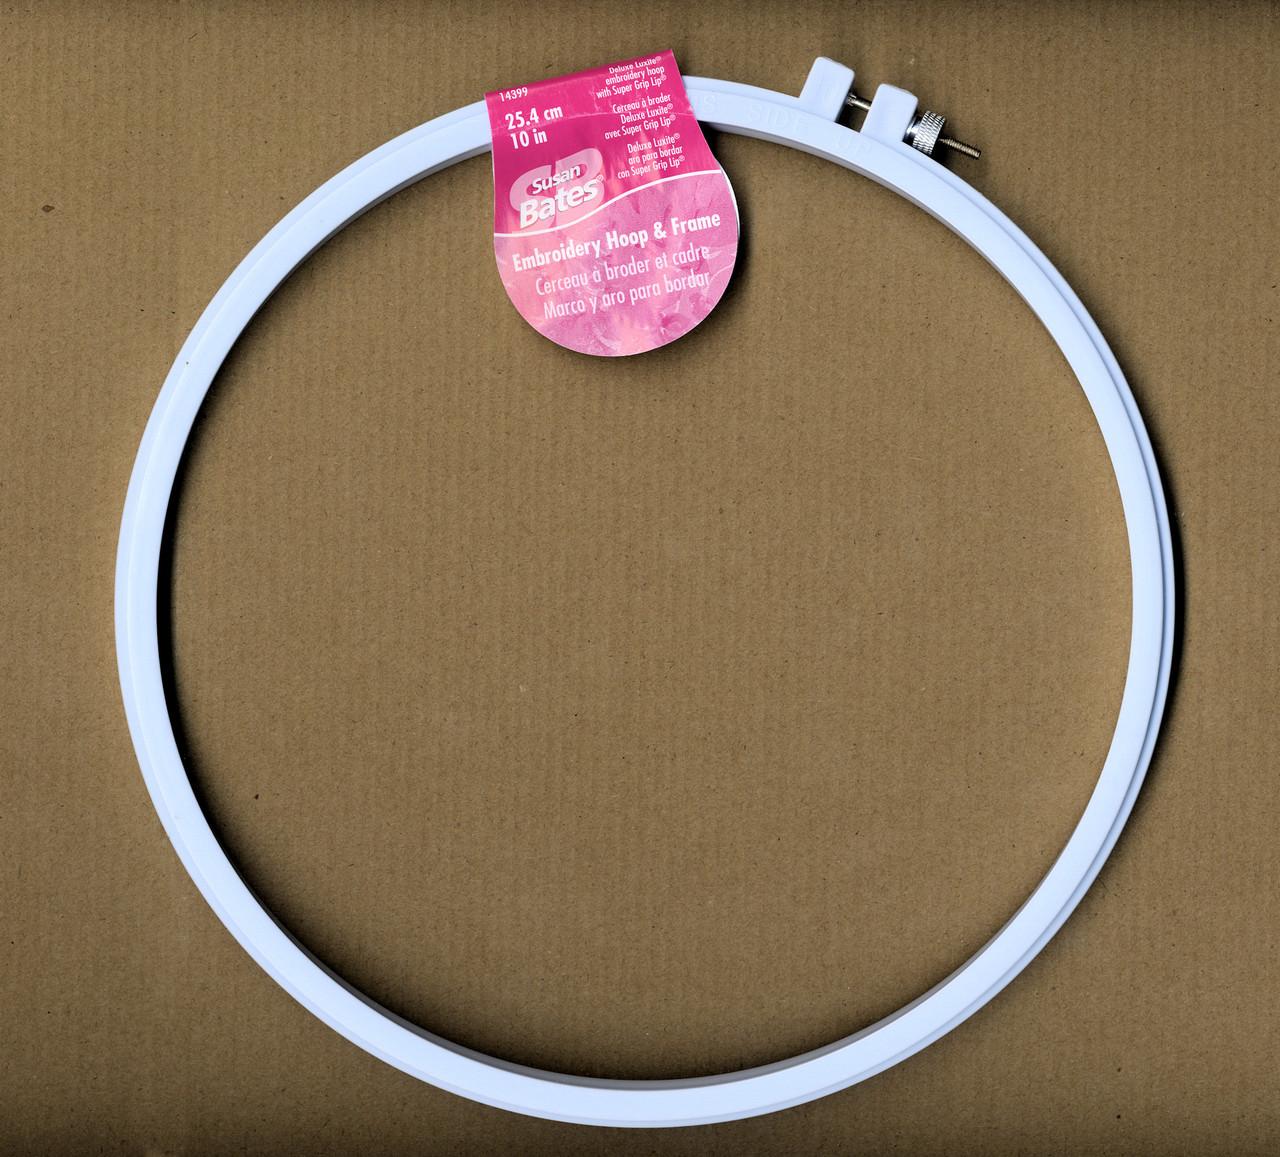 Susan Bates - 10 in Deluxe Luxite Embroidery Hoop